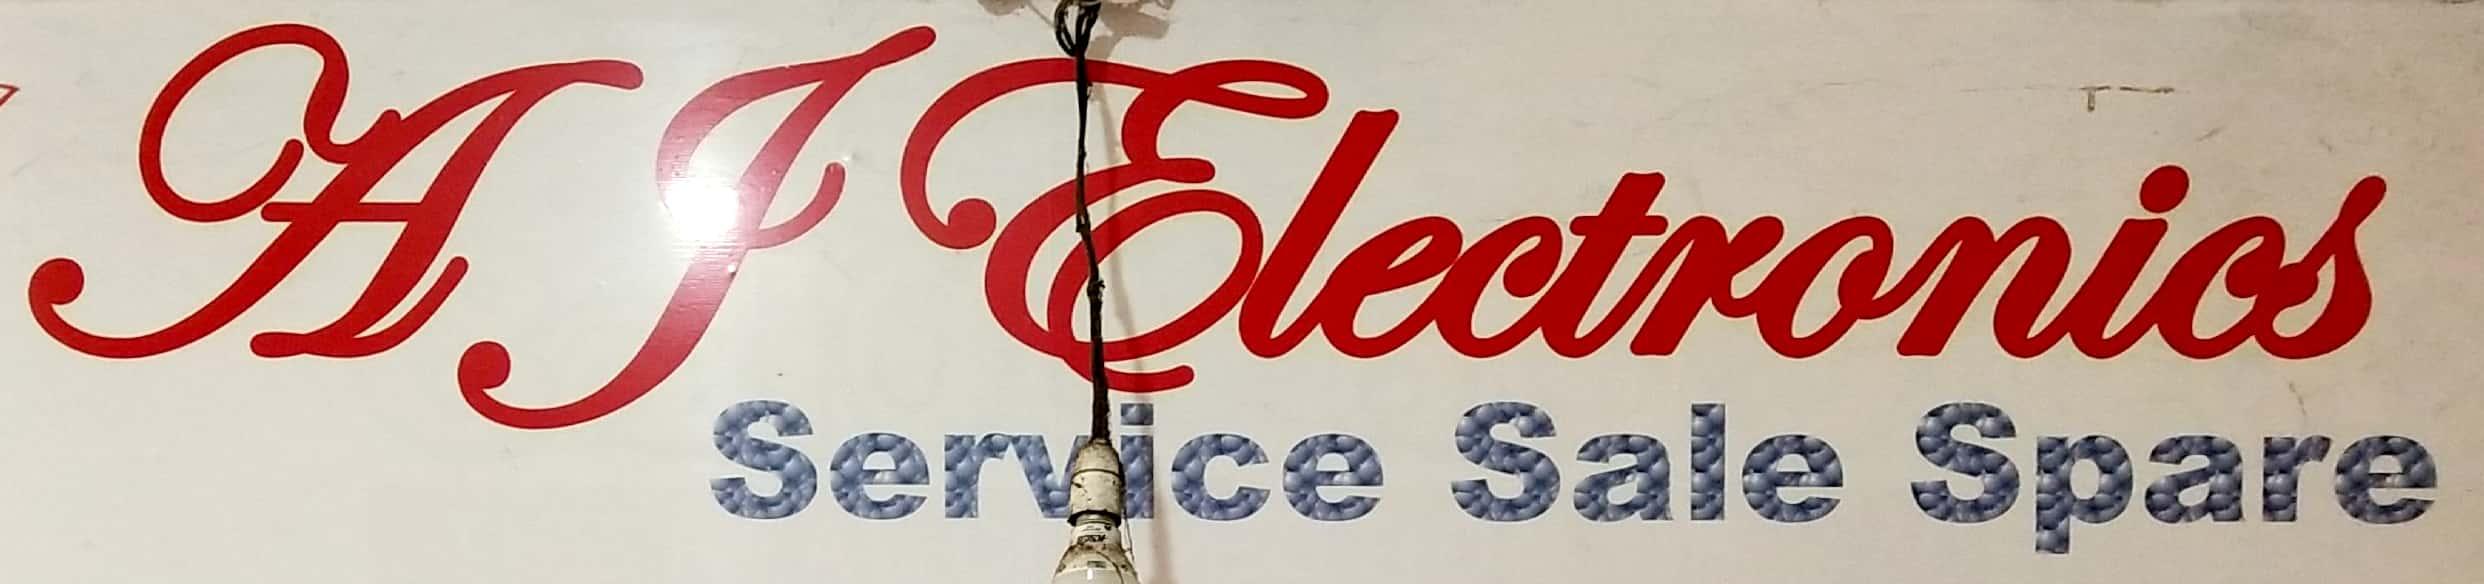 AJ ELECTRONICS, ELECTRONICS REPAIRING,  service in Farook, Kozhikode